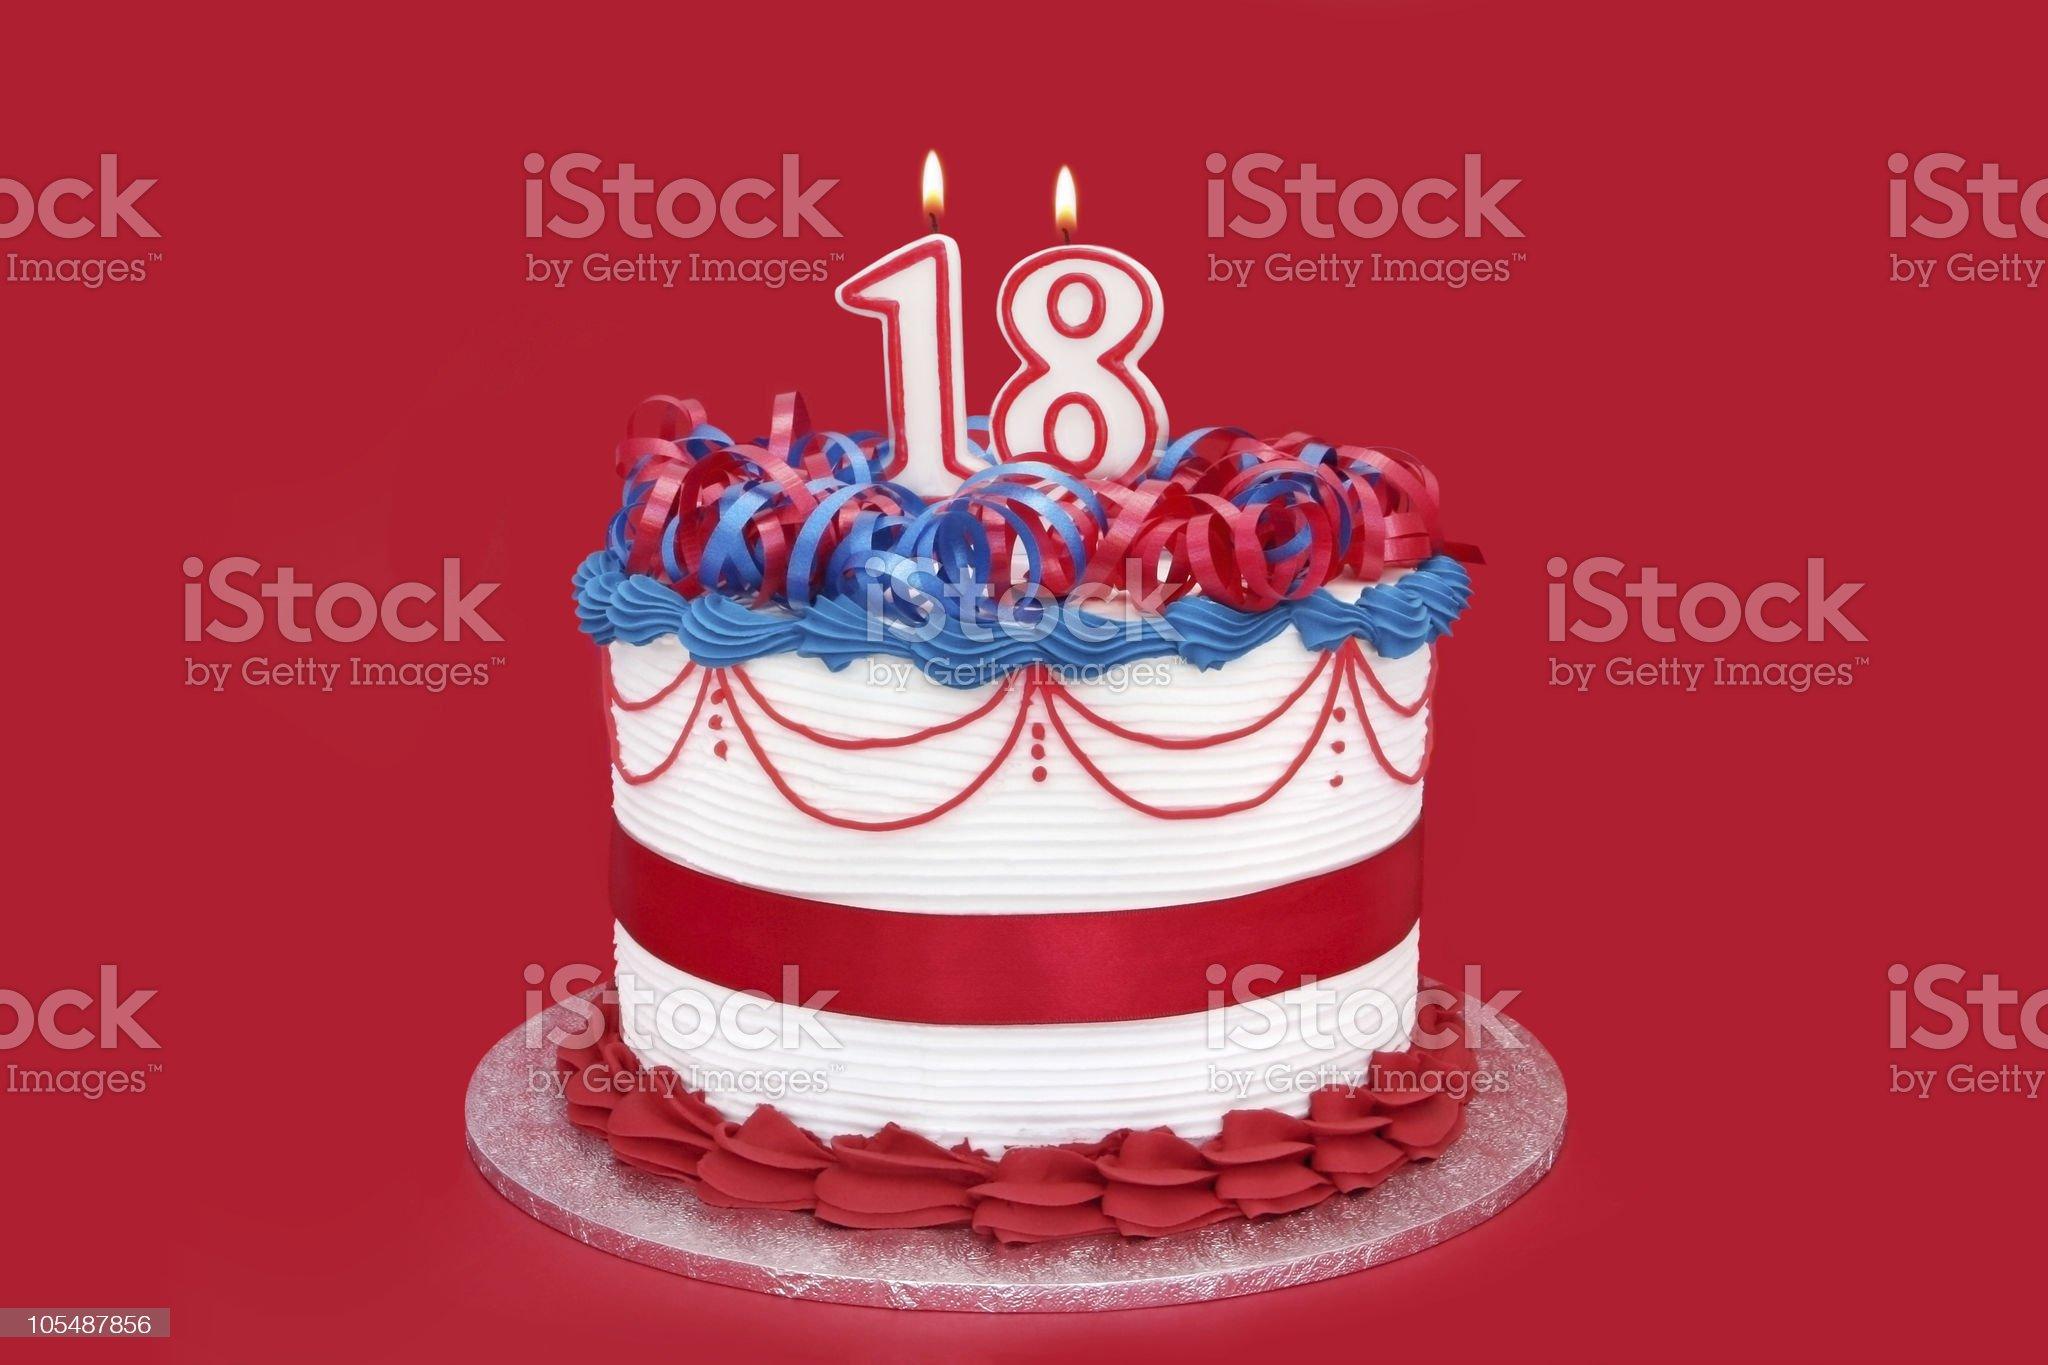 18th Cake royalty-free stock photo